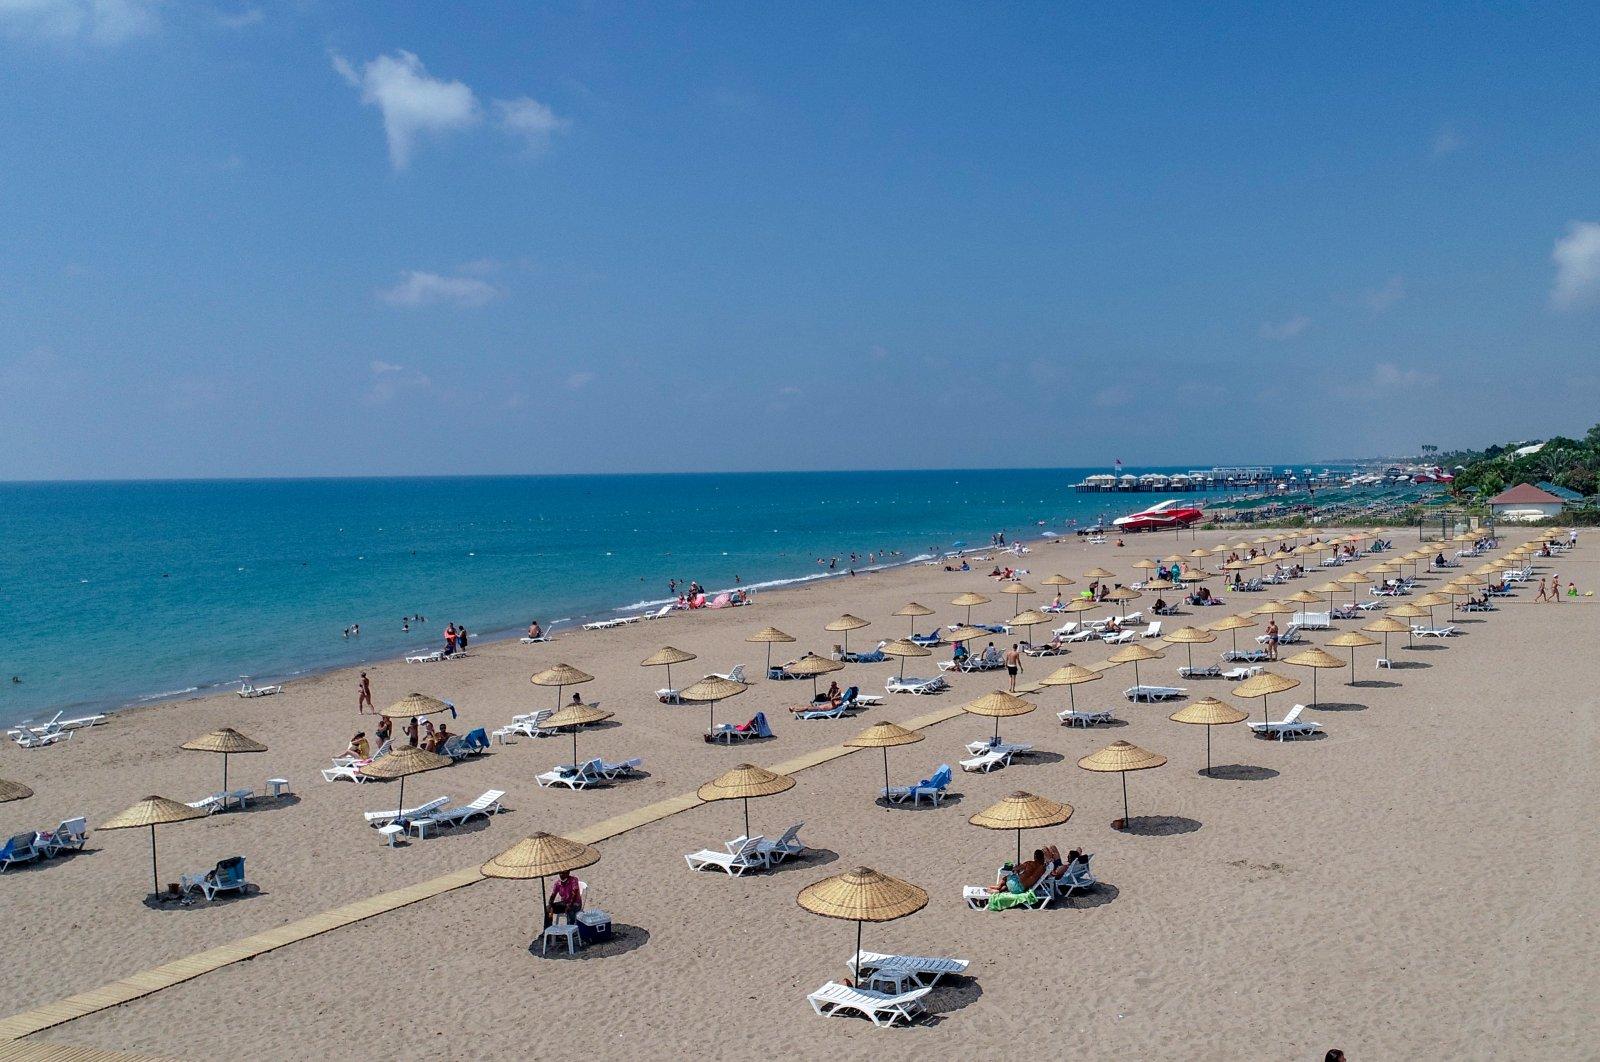 A beach in southern Antalya's Belek on Turkey's Mediterranean coast, Aug. 20, 2020 (AA Photo)